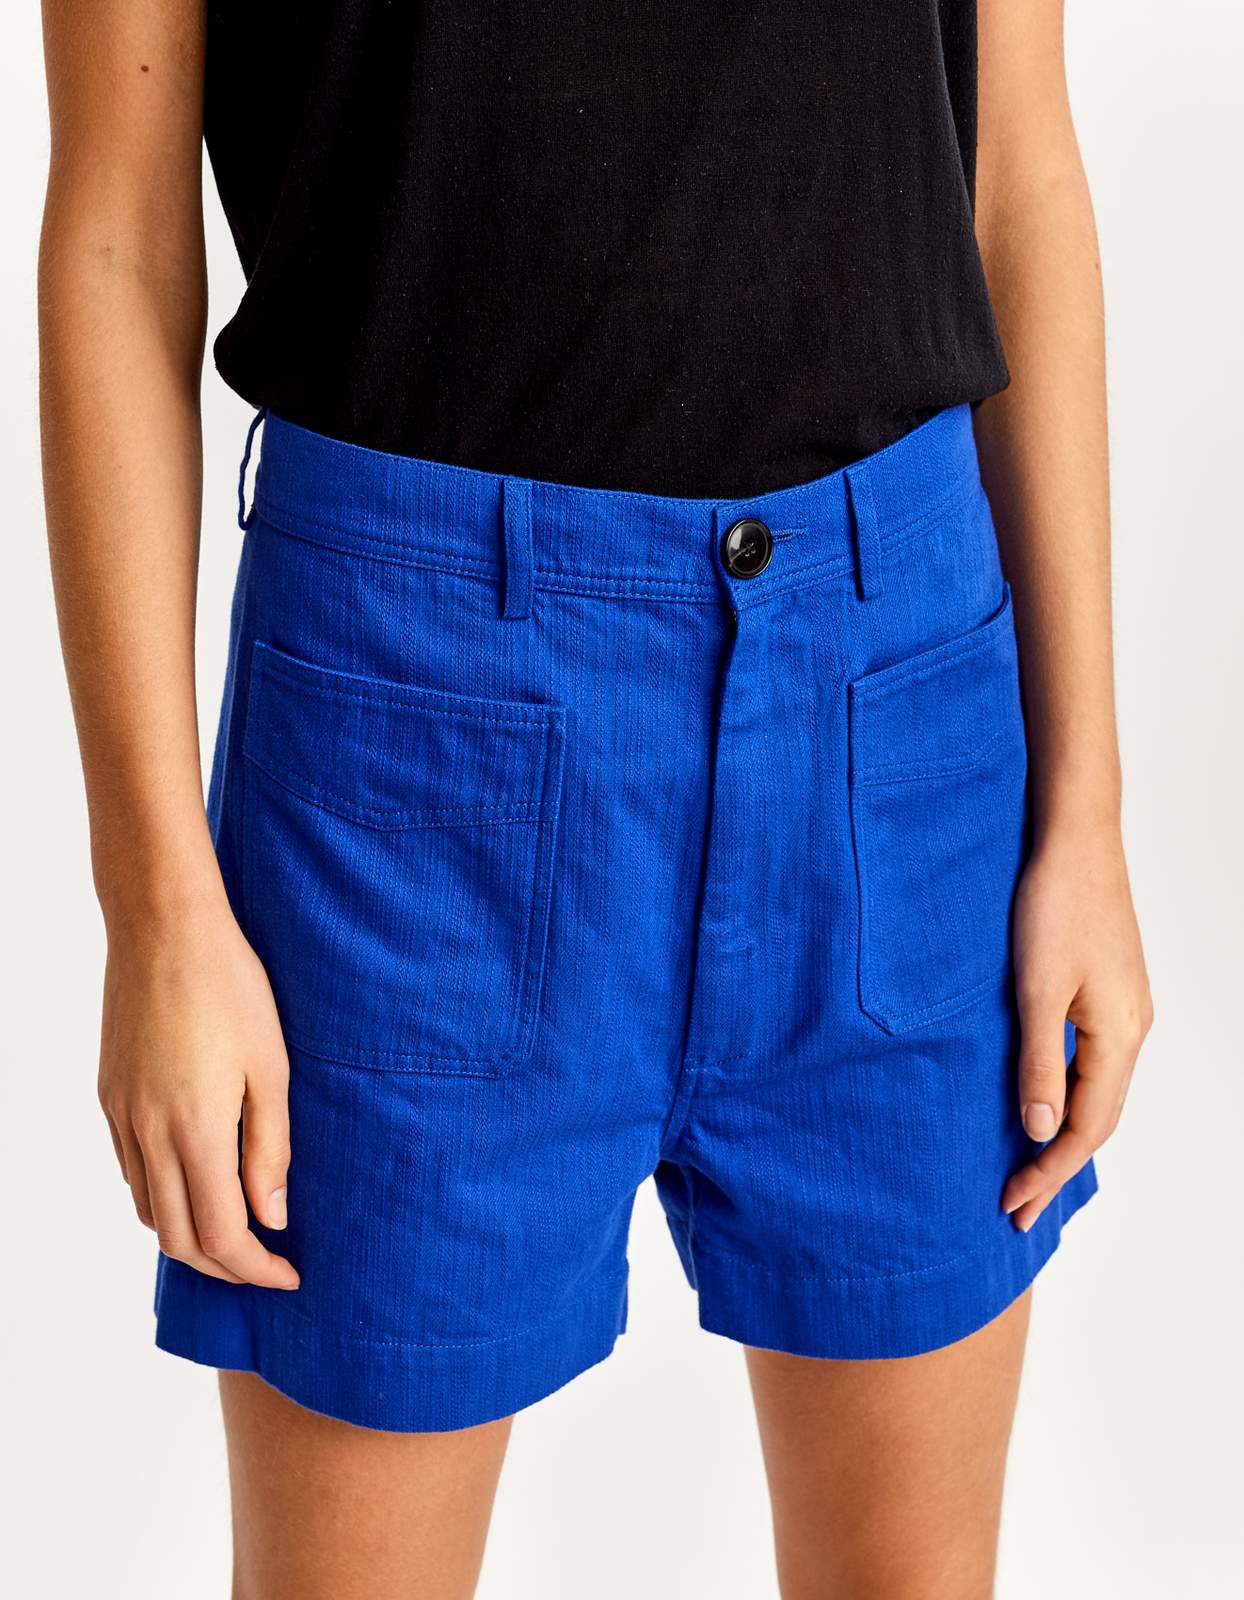 bellerose-shorts-lolof-P1023-klein_1600x1600.jpg